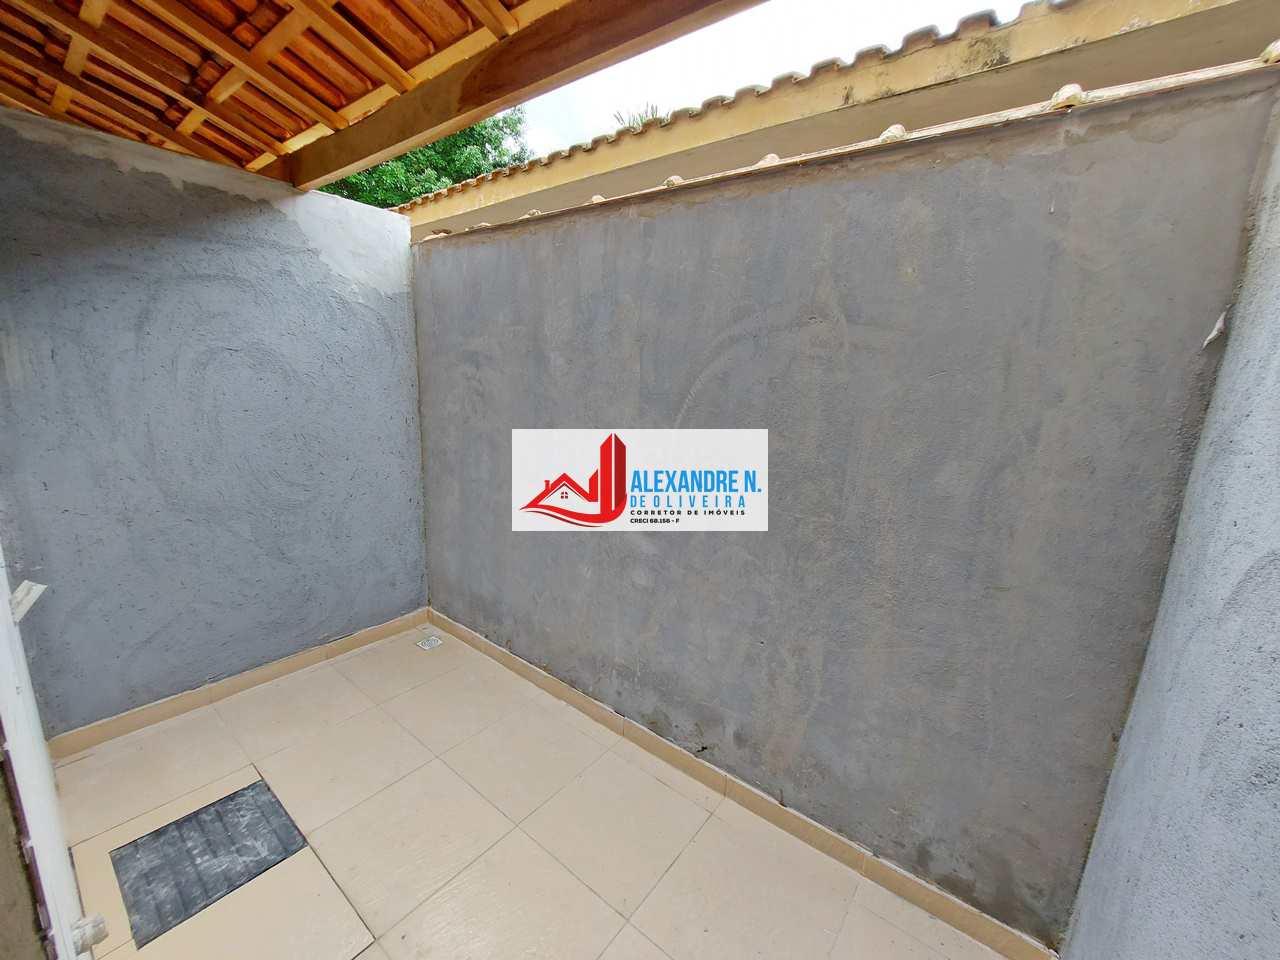 Sobrado novo, 2 dorms, Tupi, Praia Grande, R$ 220 mil, SB00025